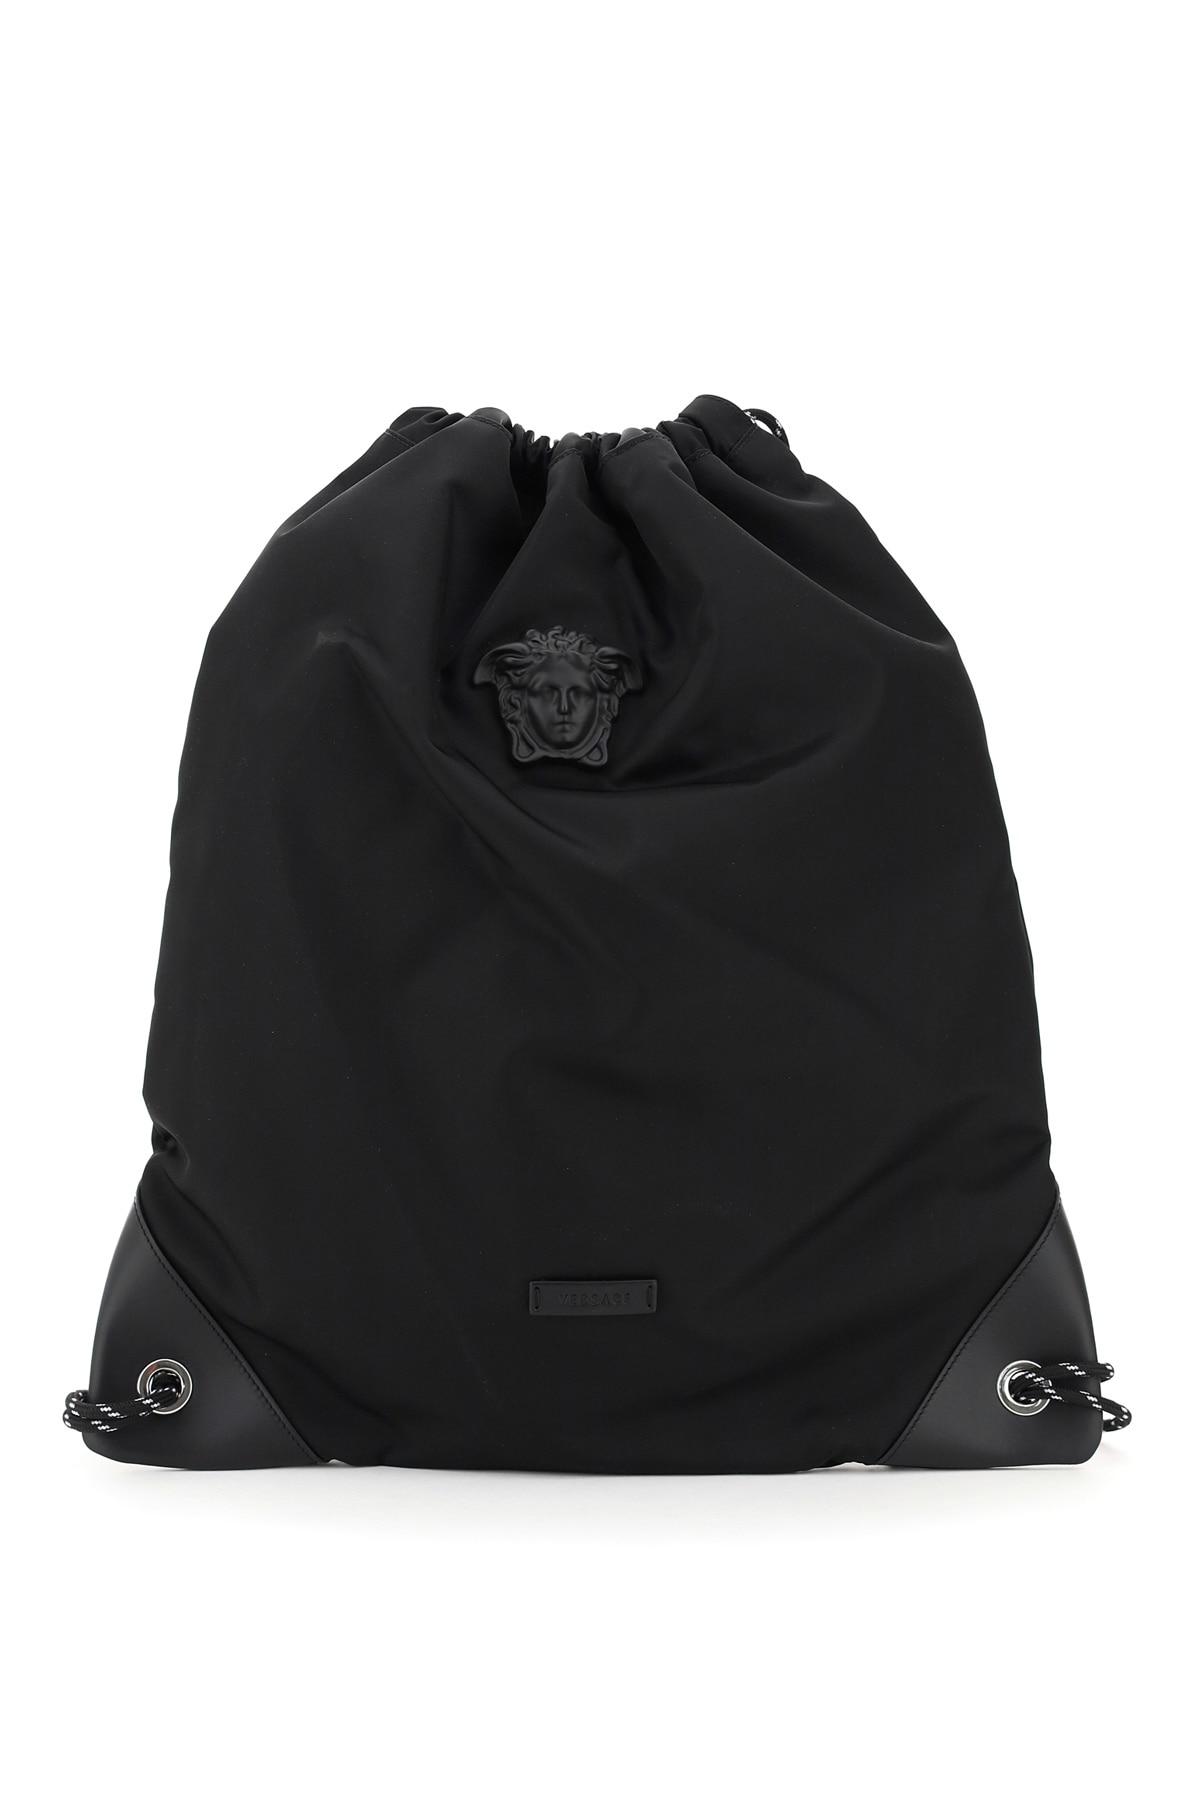 VERSACE MEDUSA NYLON BACKPACK SACK OS Black Leather, Technical